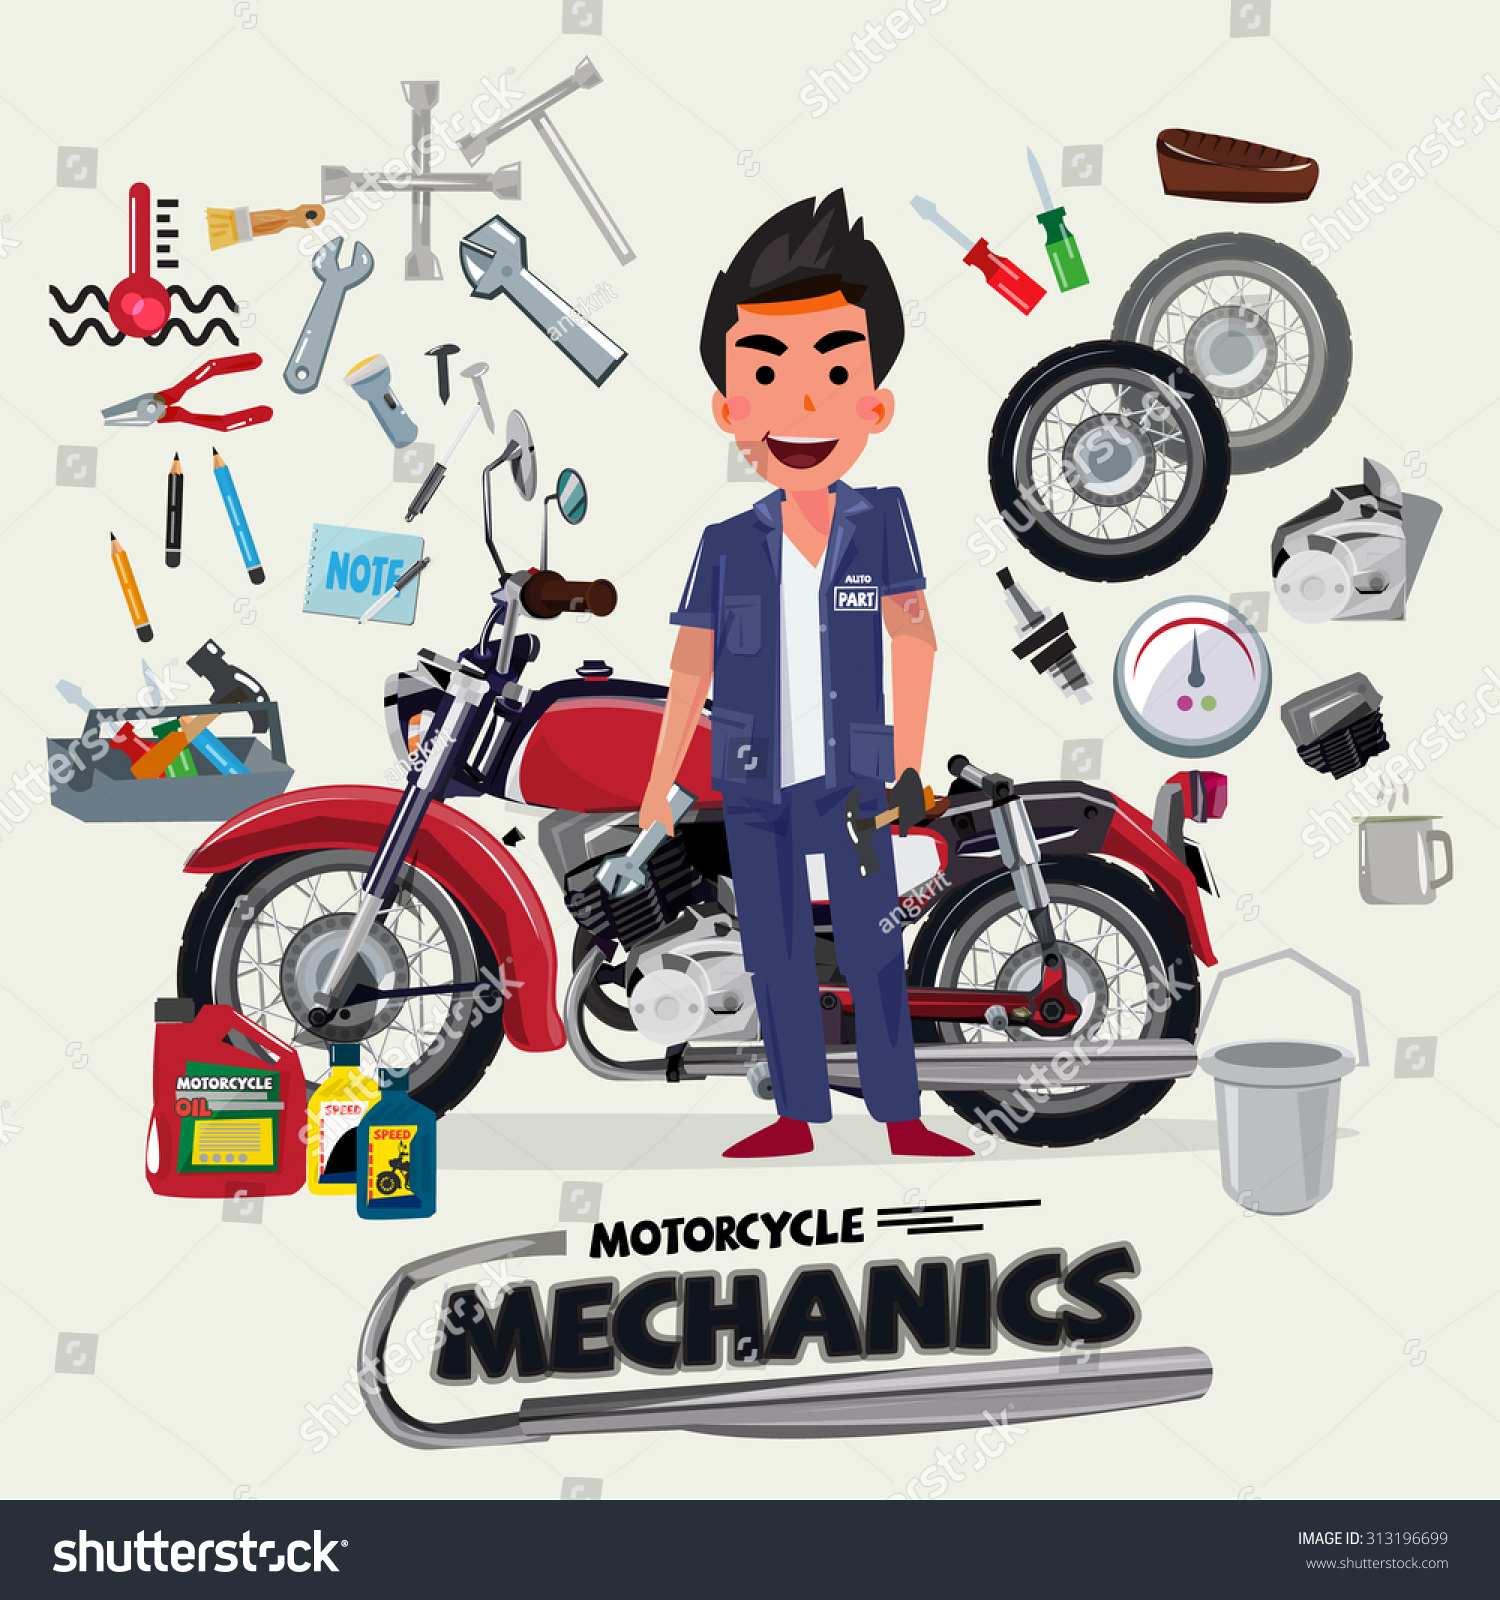 Motorcycle Mechanics Tool Kit Character Design Stock